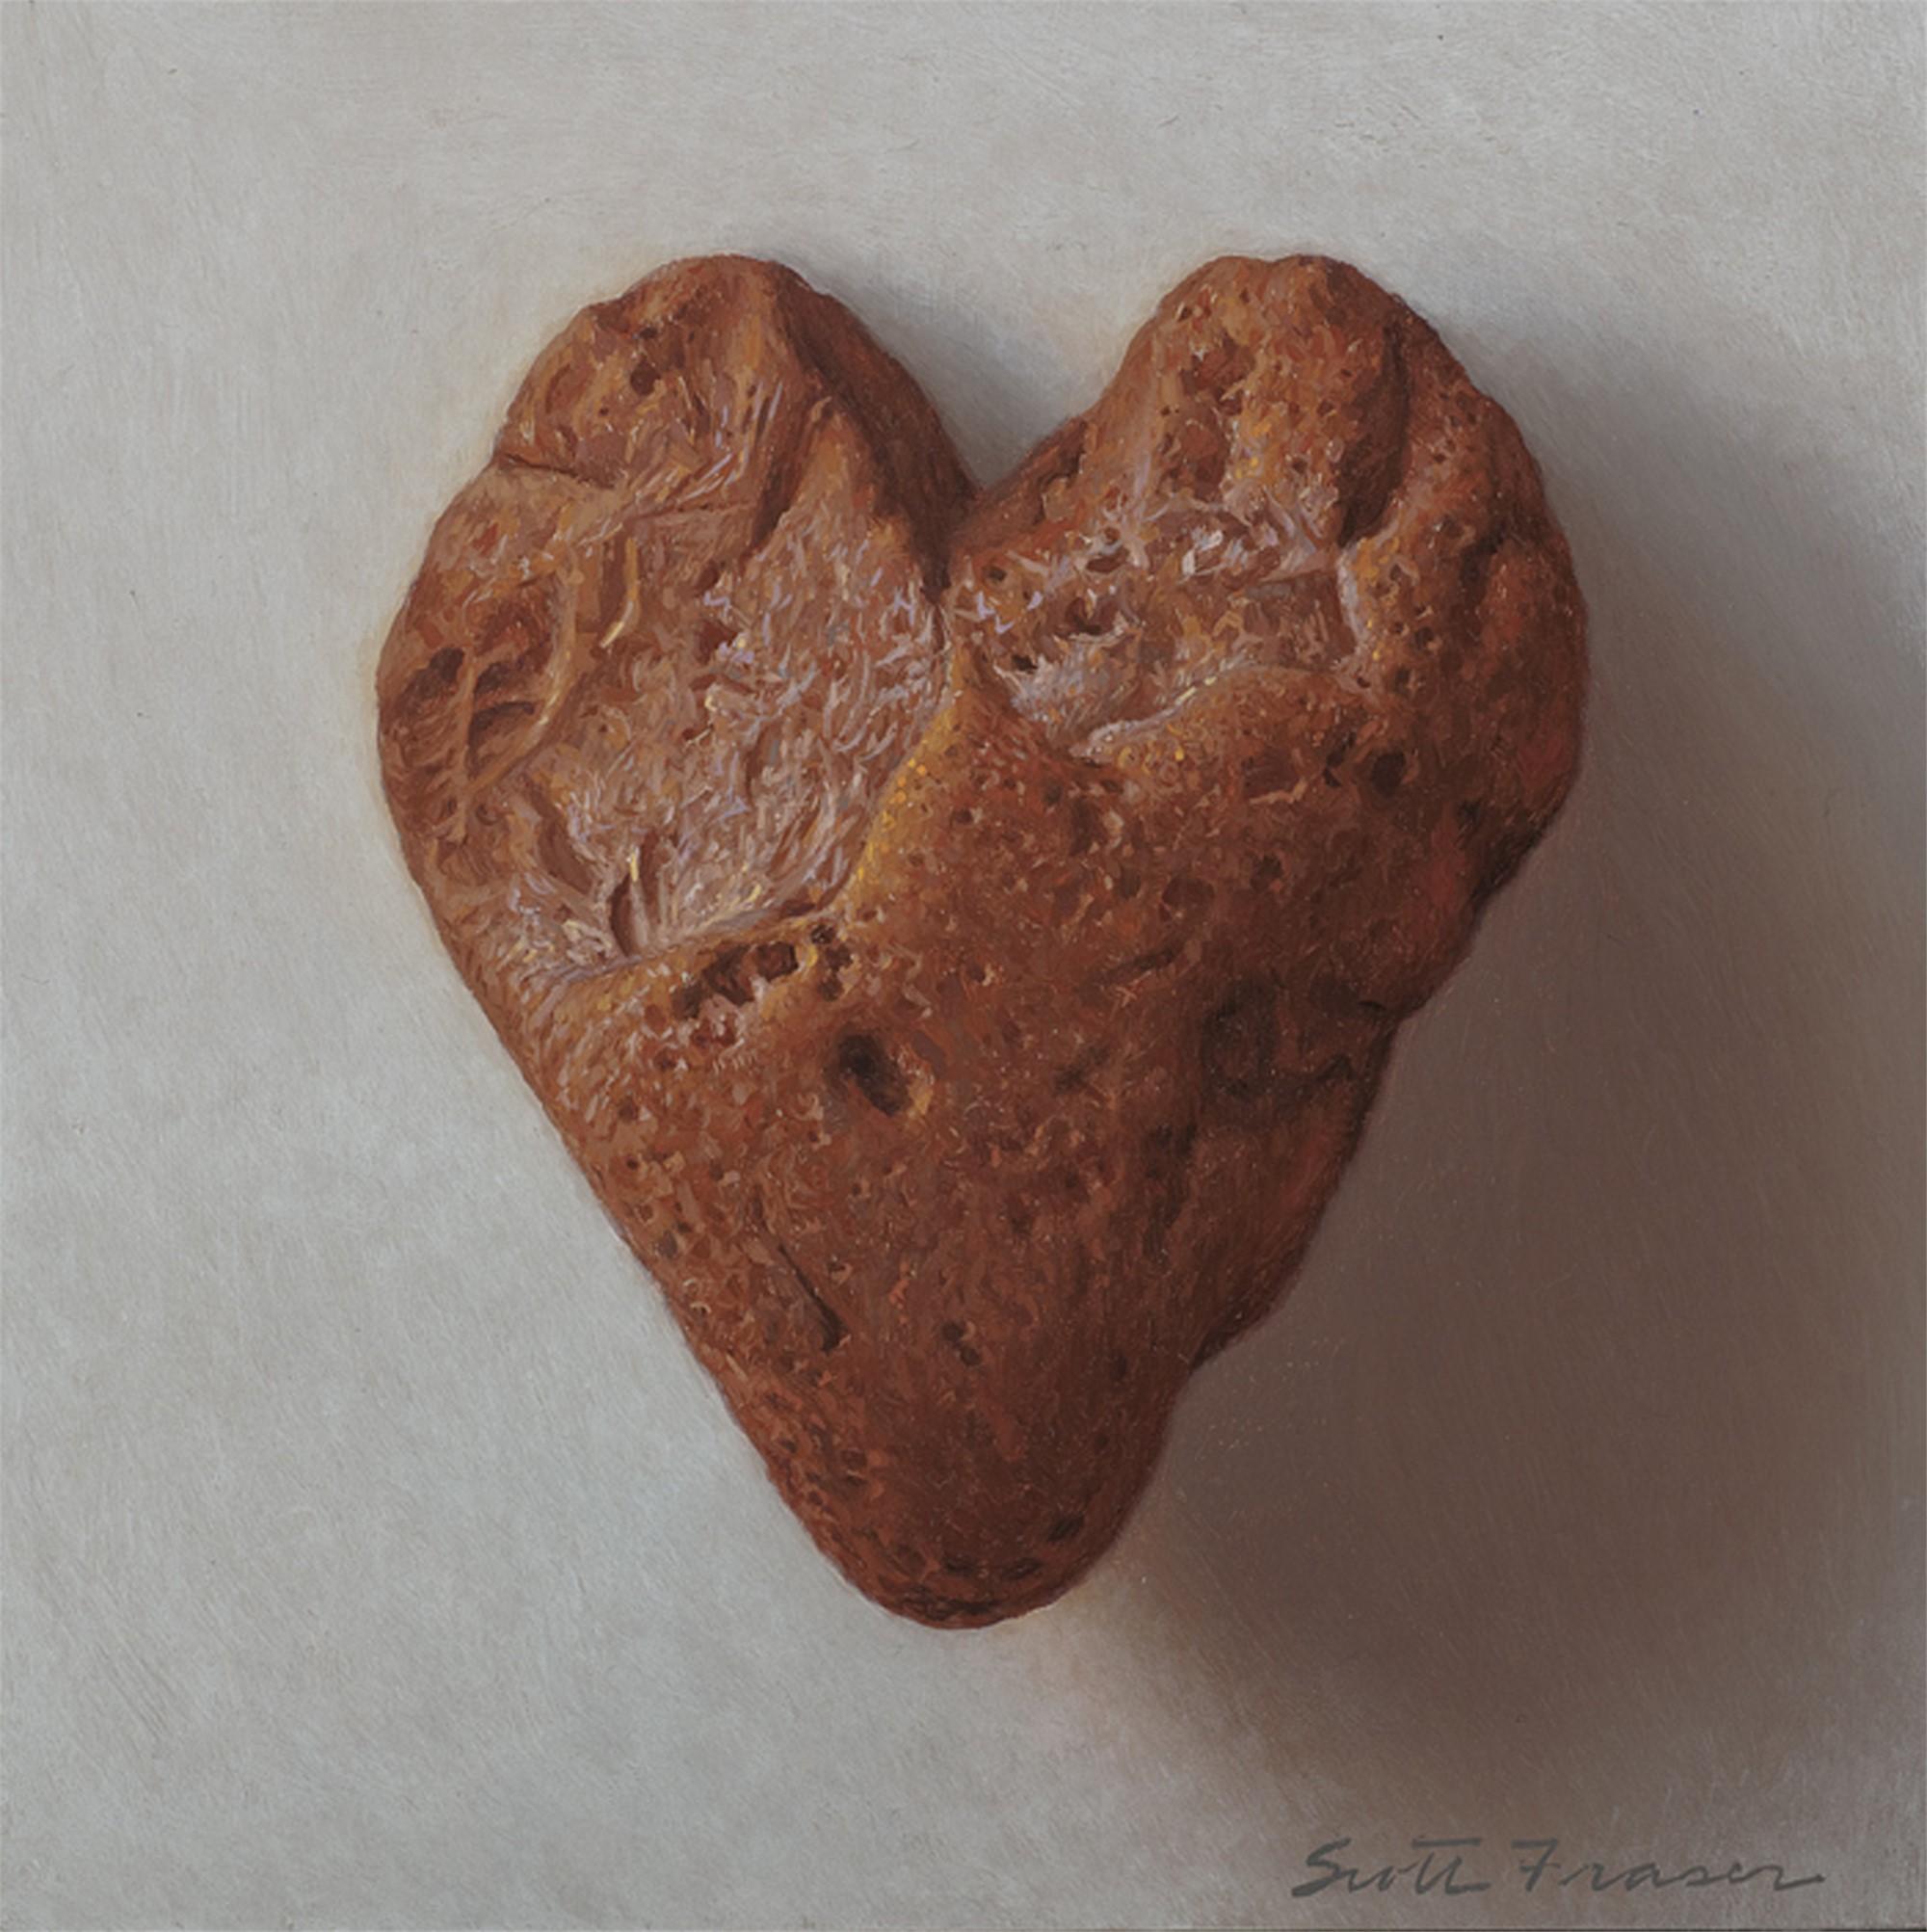 Red Brick Heart by Scott Fraser